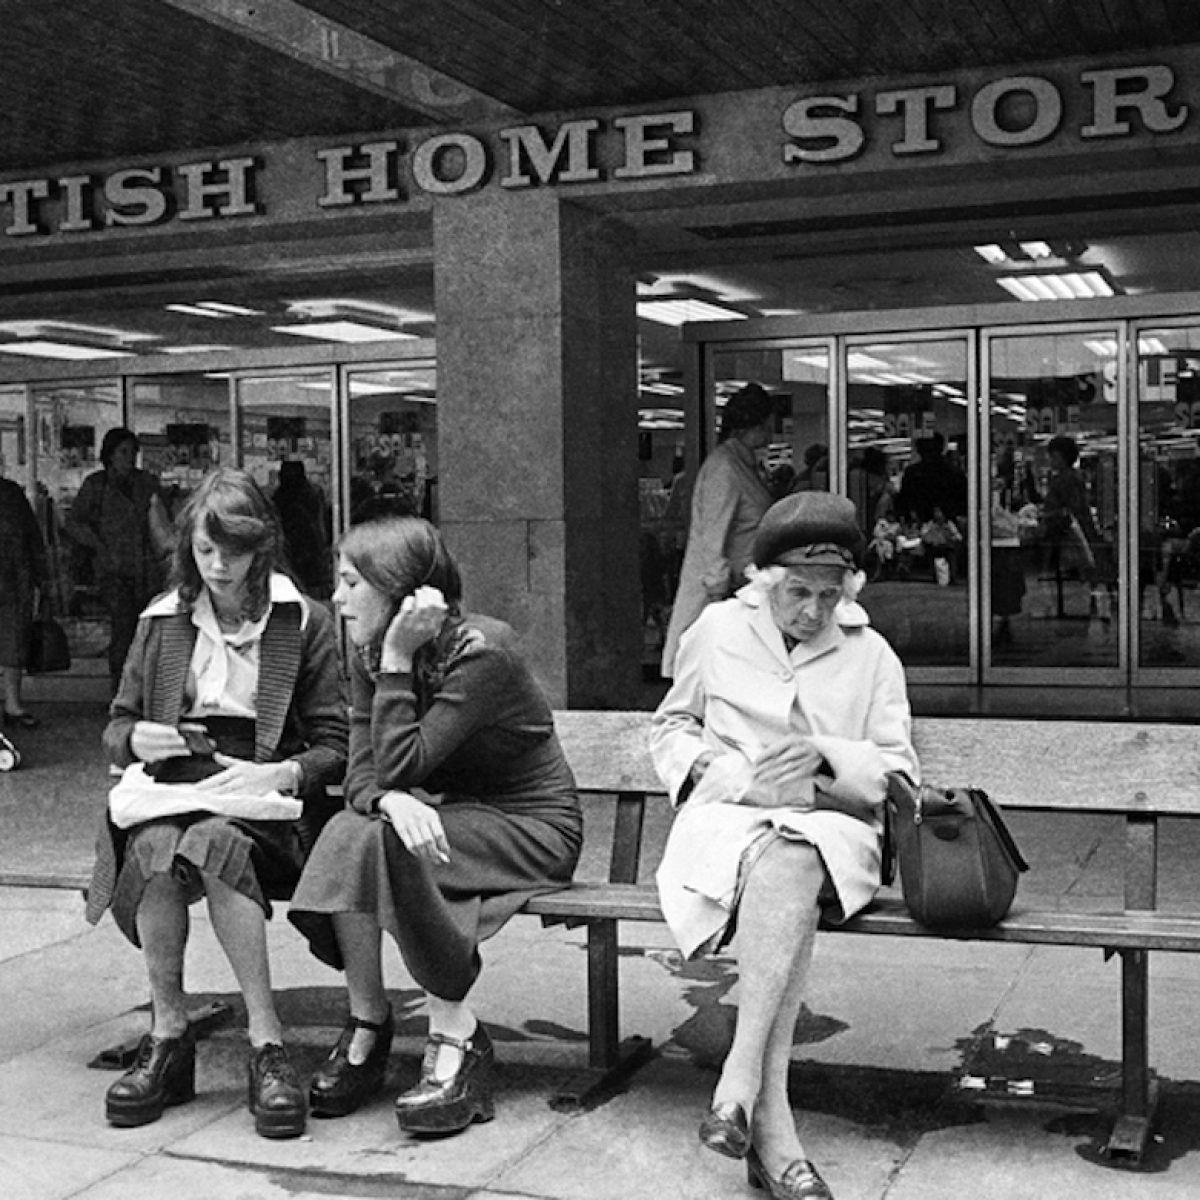 BHS, Mander Centre. Wolverhampton, 1970s.